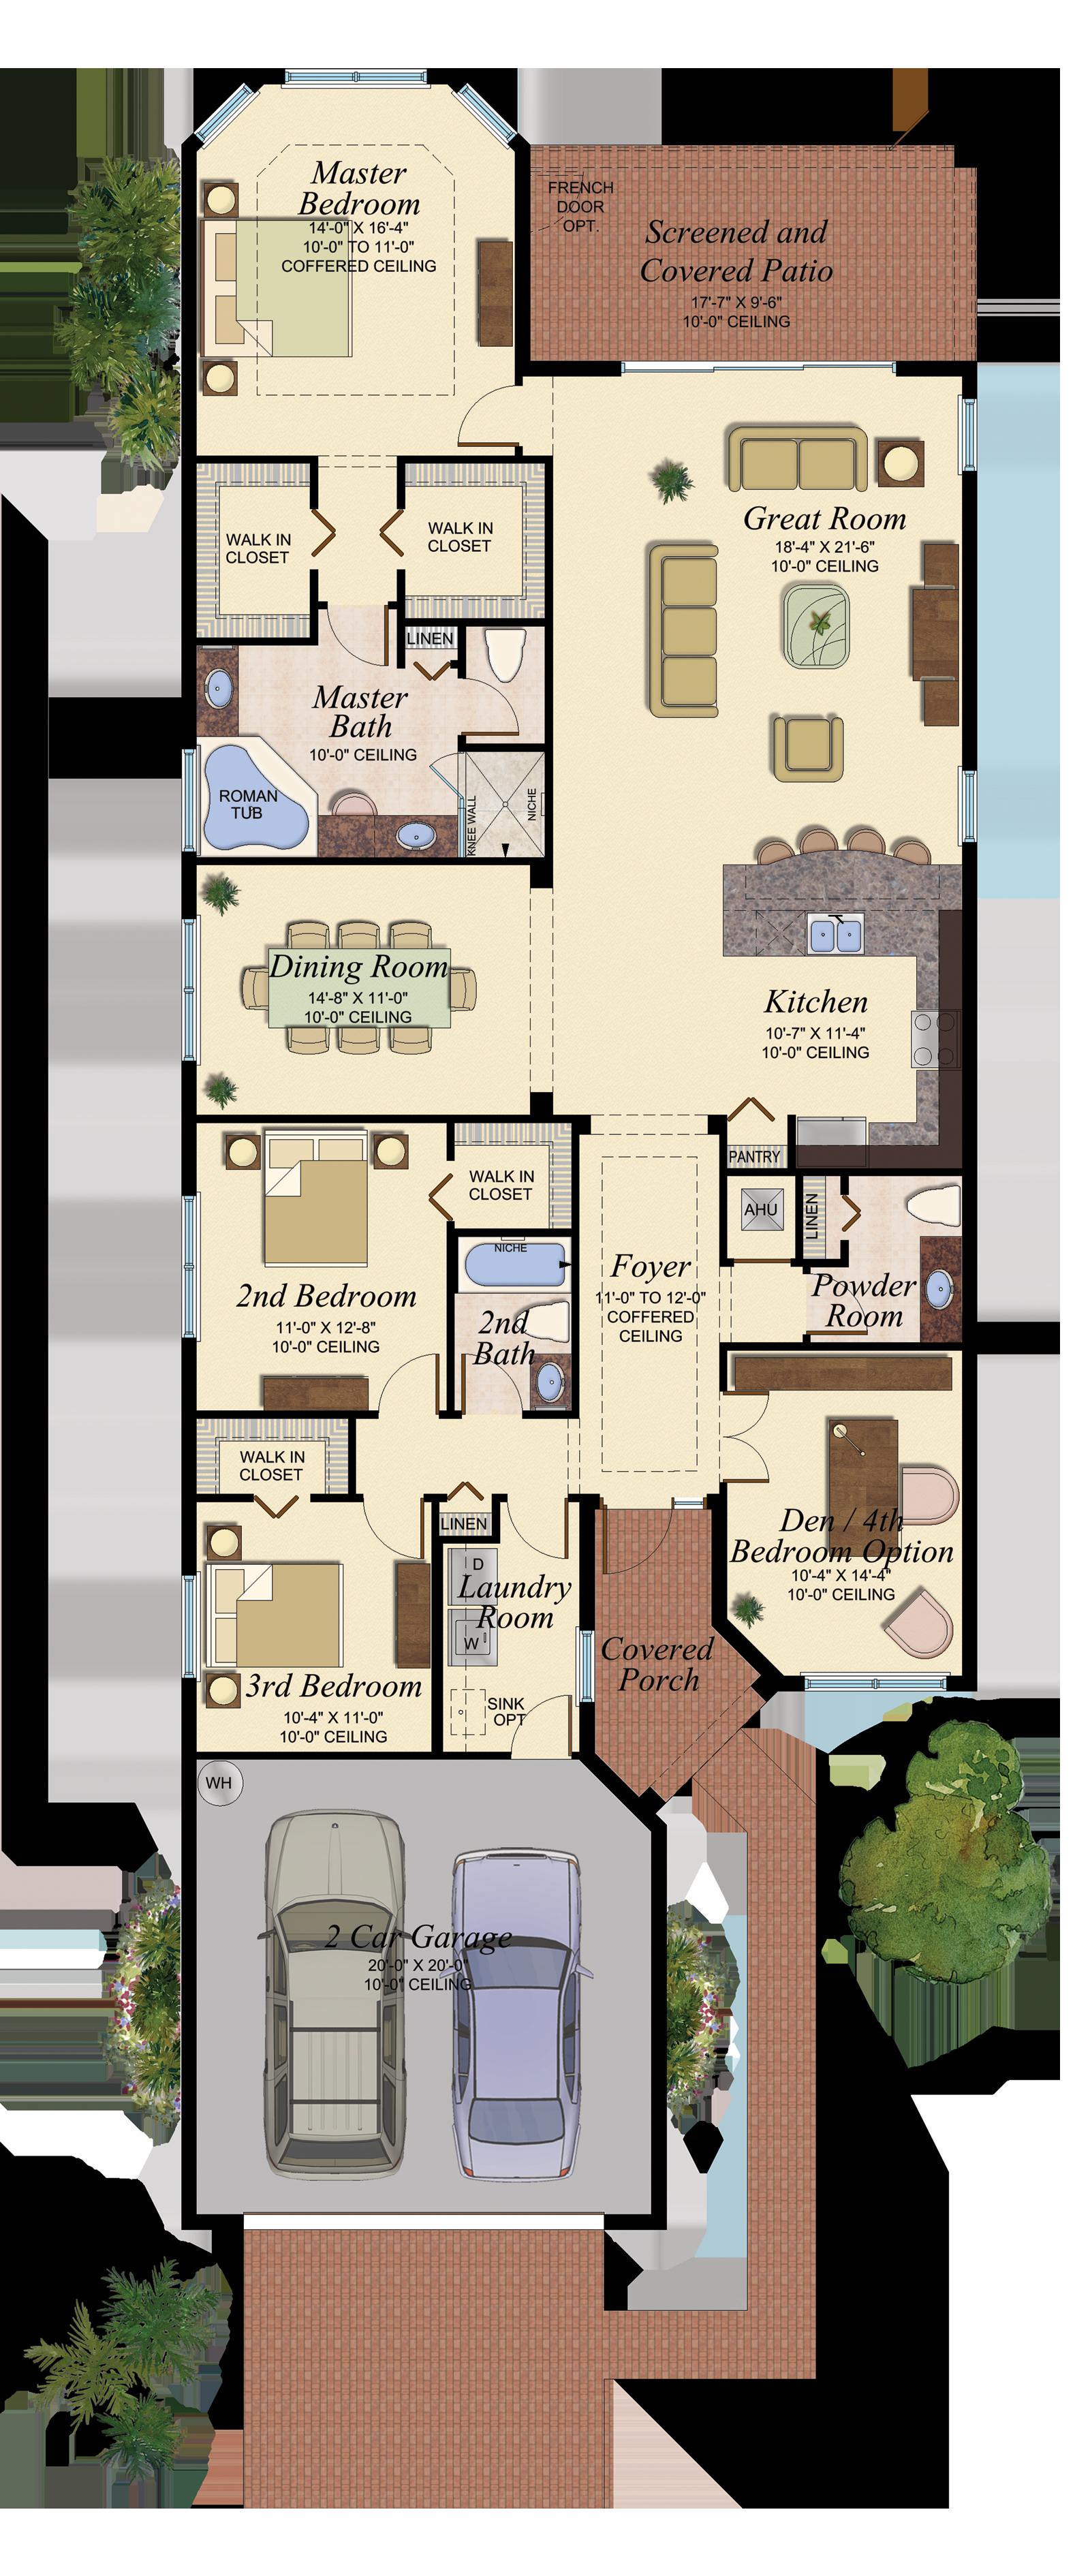 Gl Homes Model House Plan Narrow House Plans Mediterranean House Plans